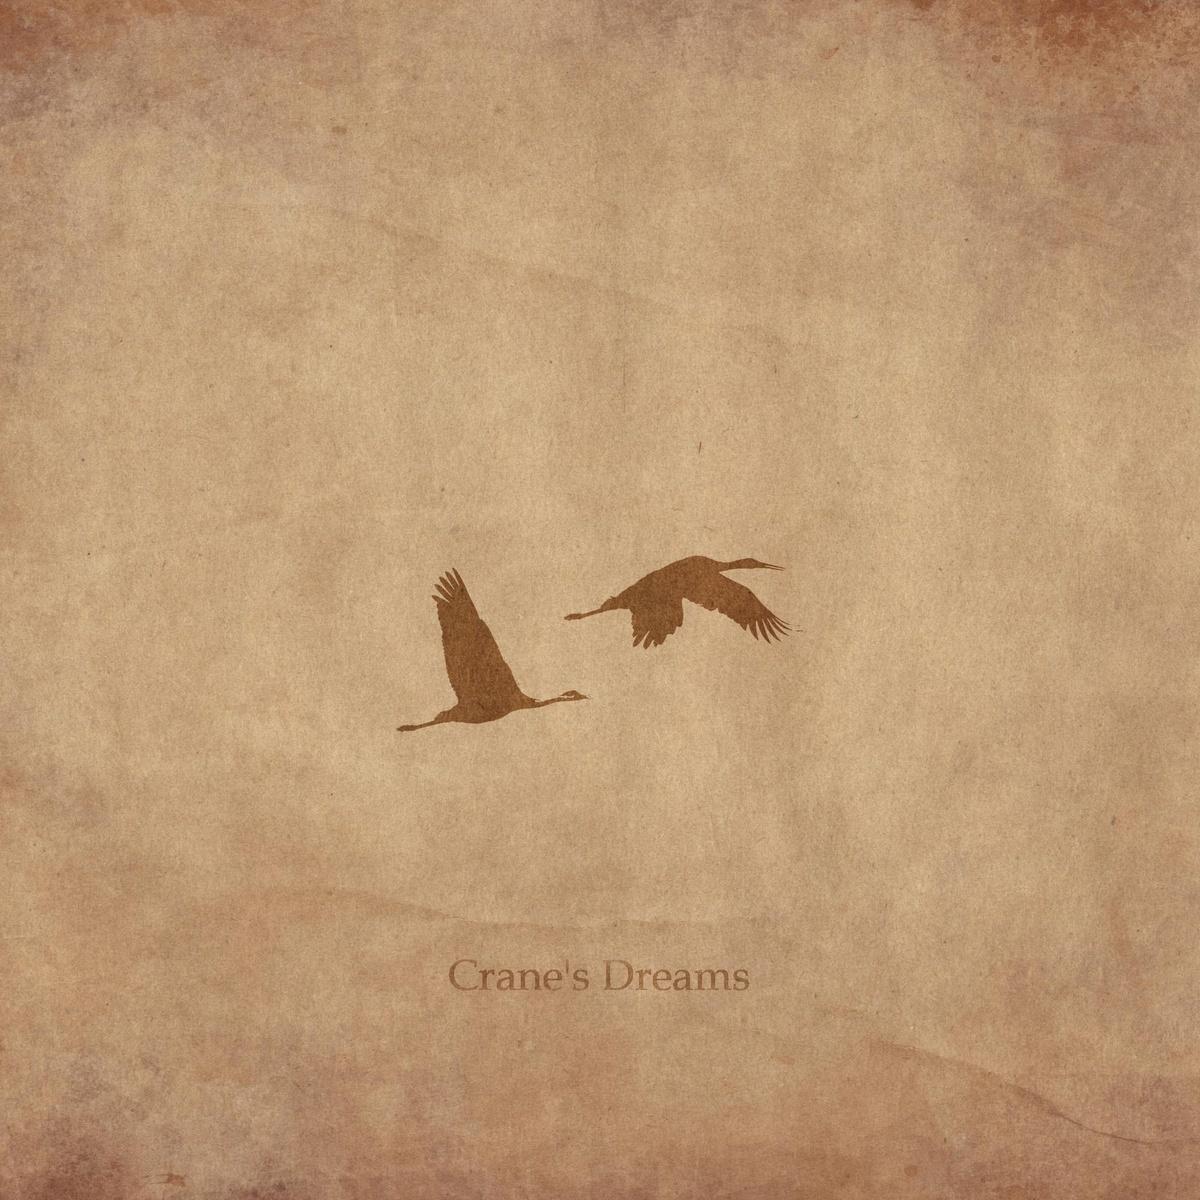 crane's dreams cover